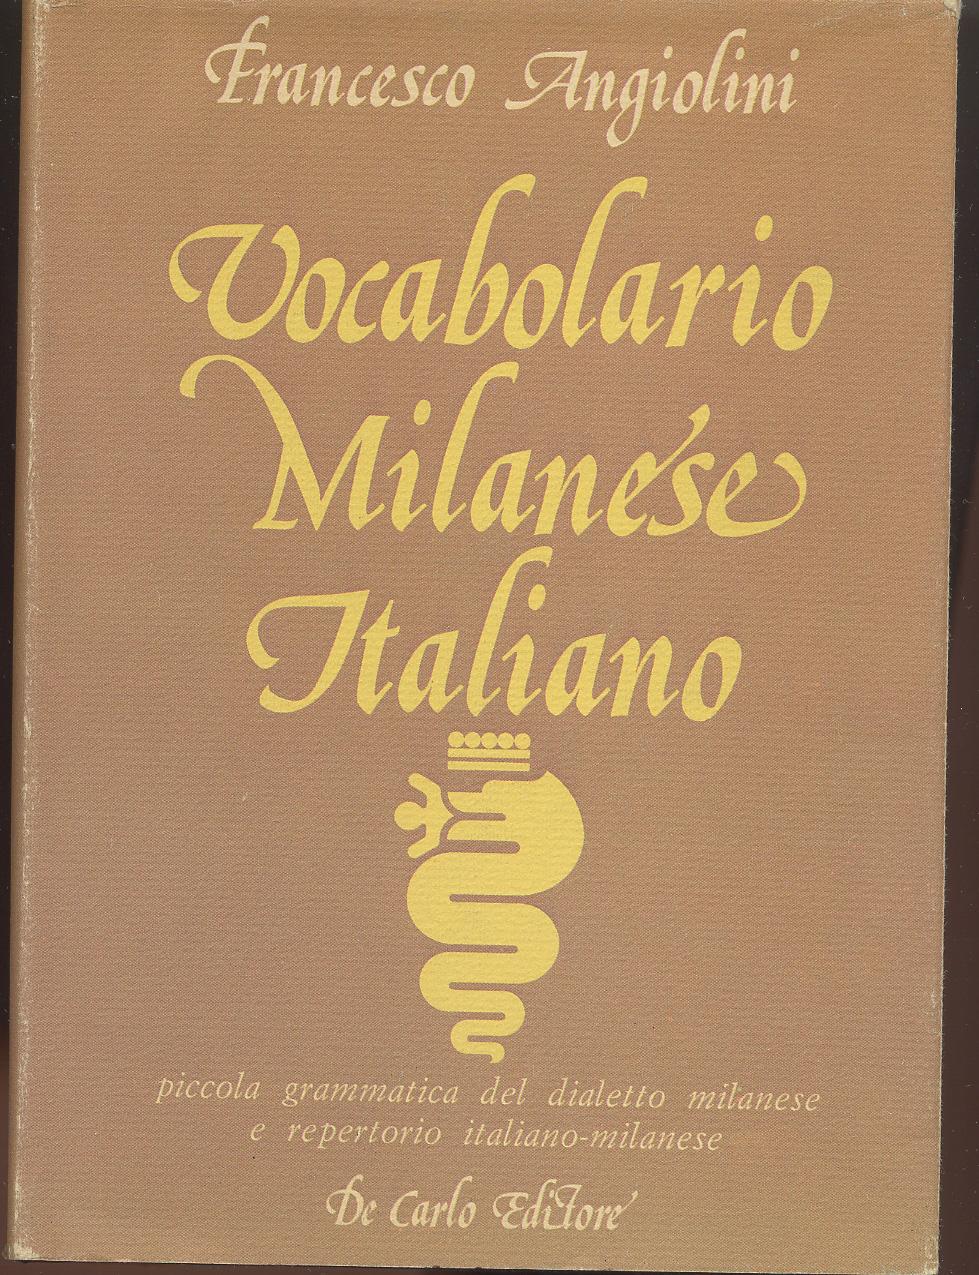 Vocabolario Milanese Italiano